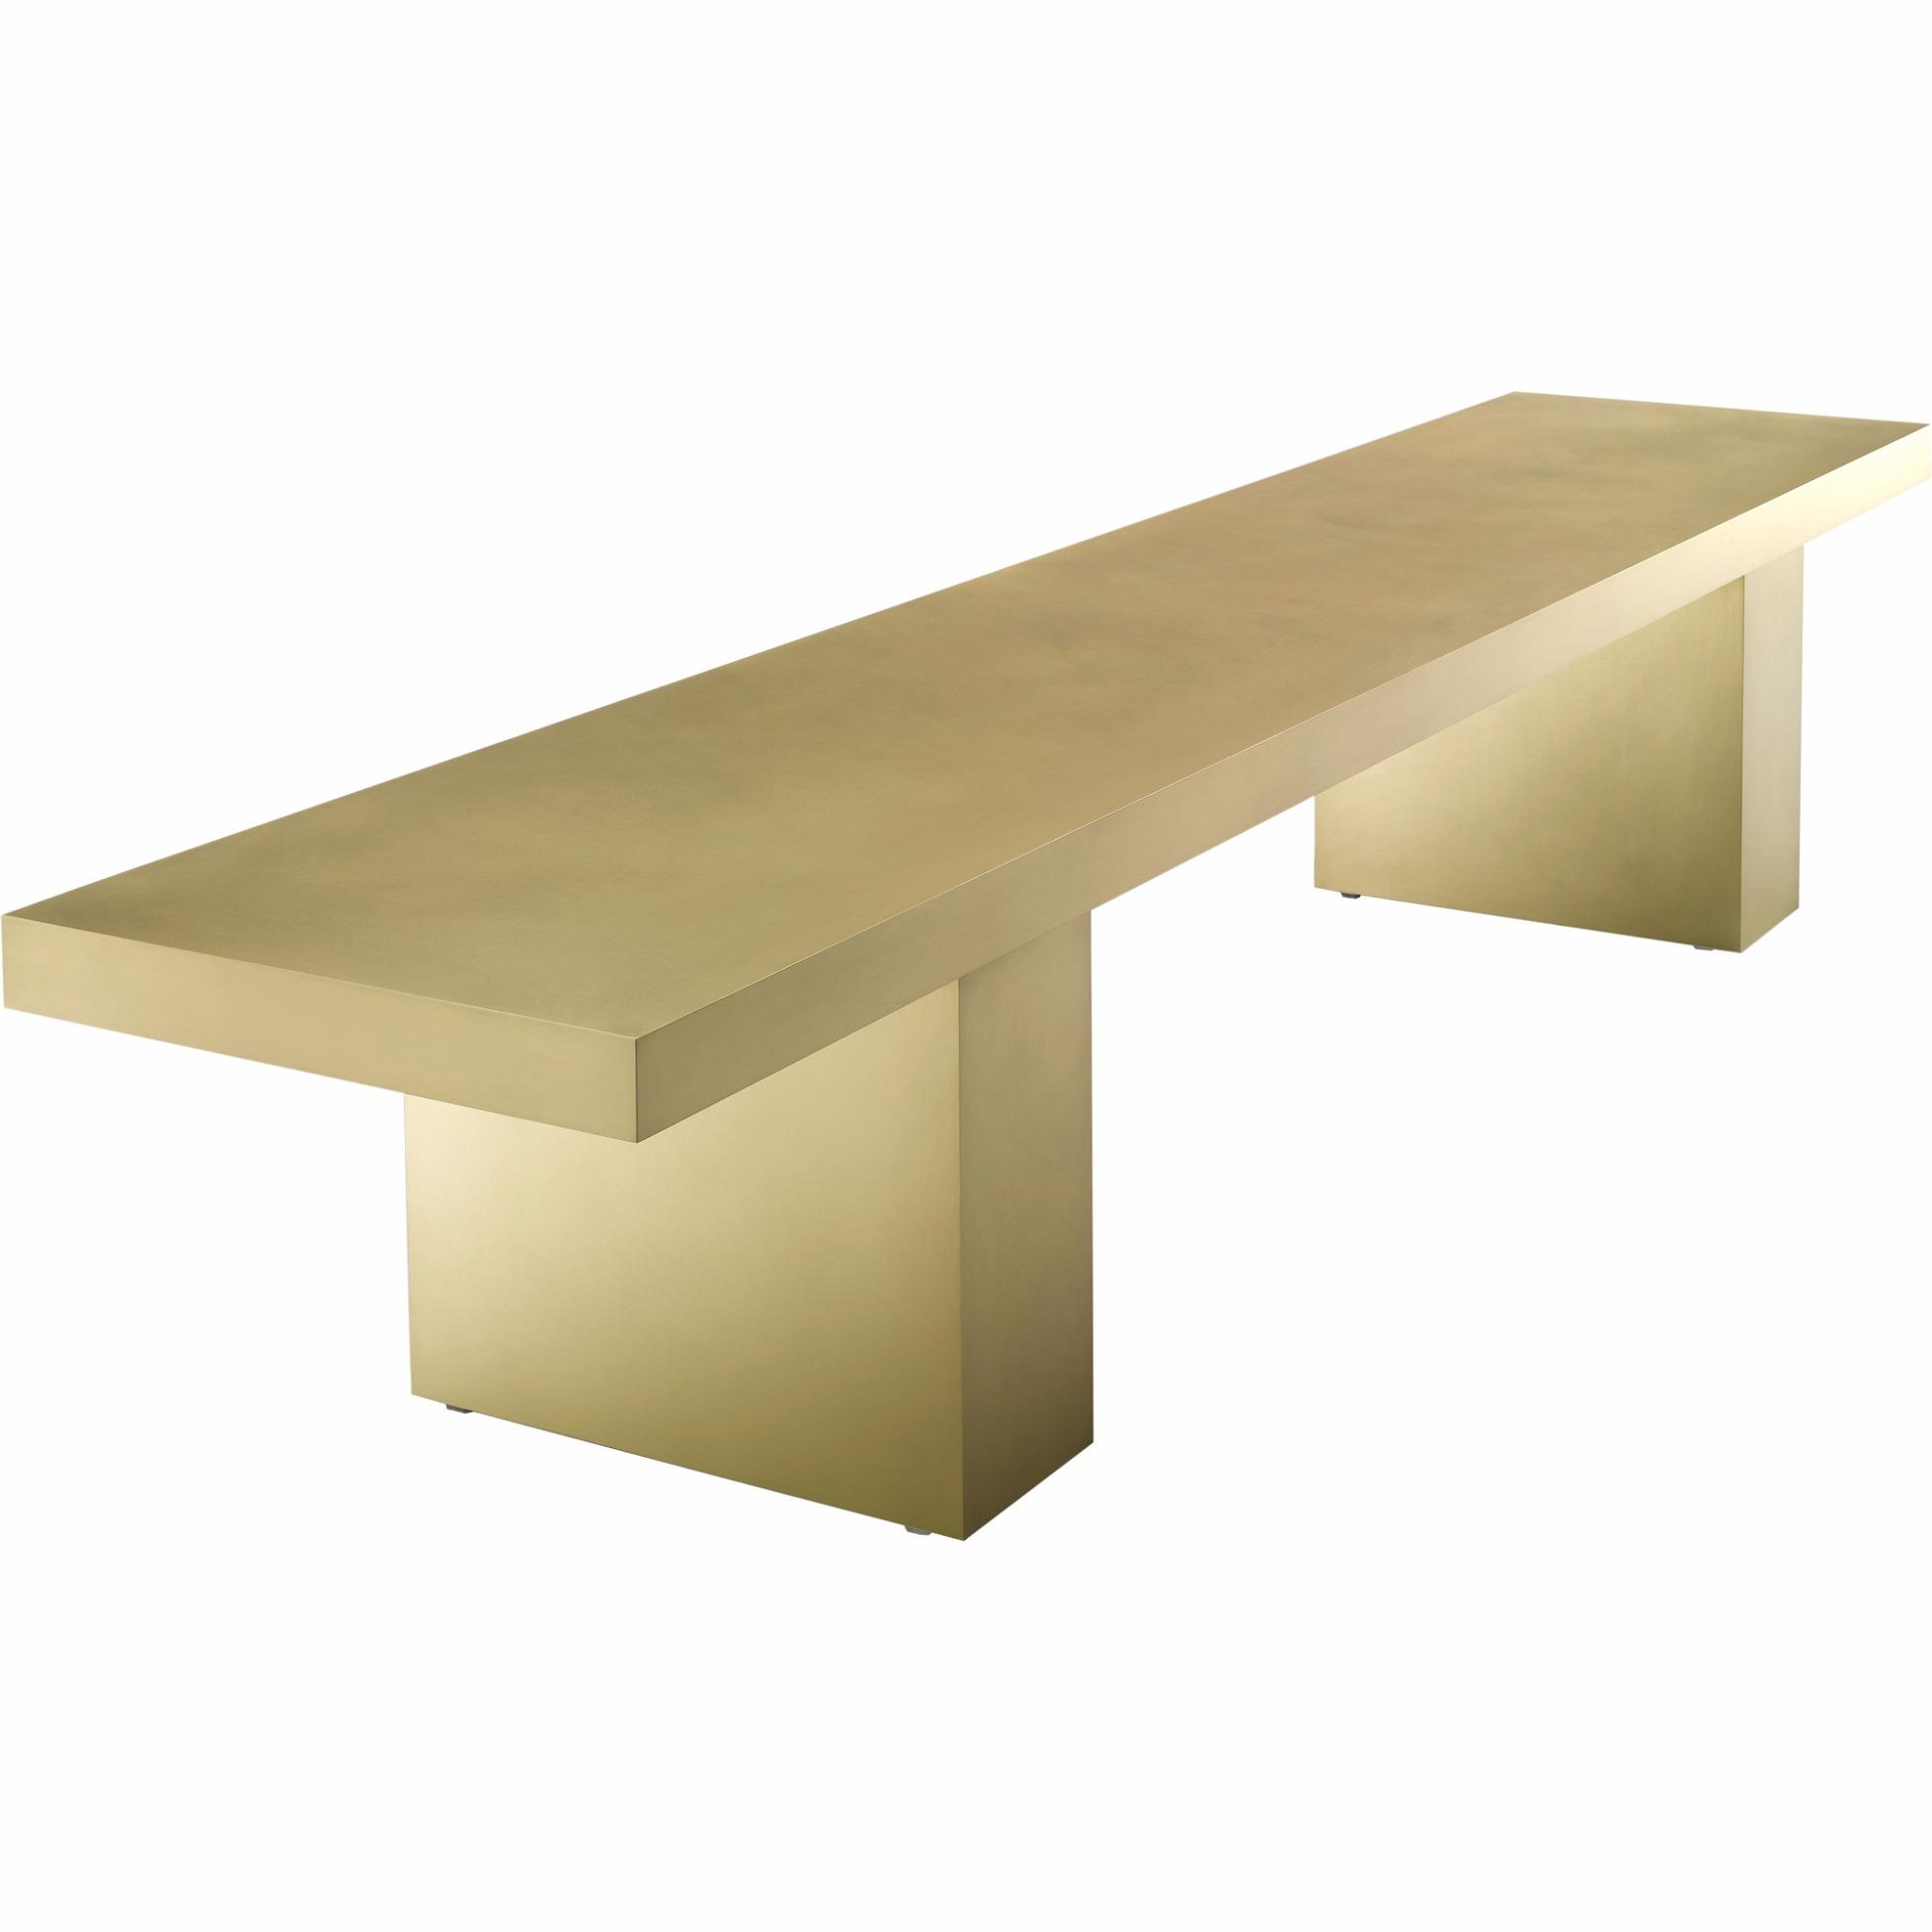 Bench Link 2 Brass By Mdf Italia